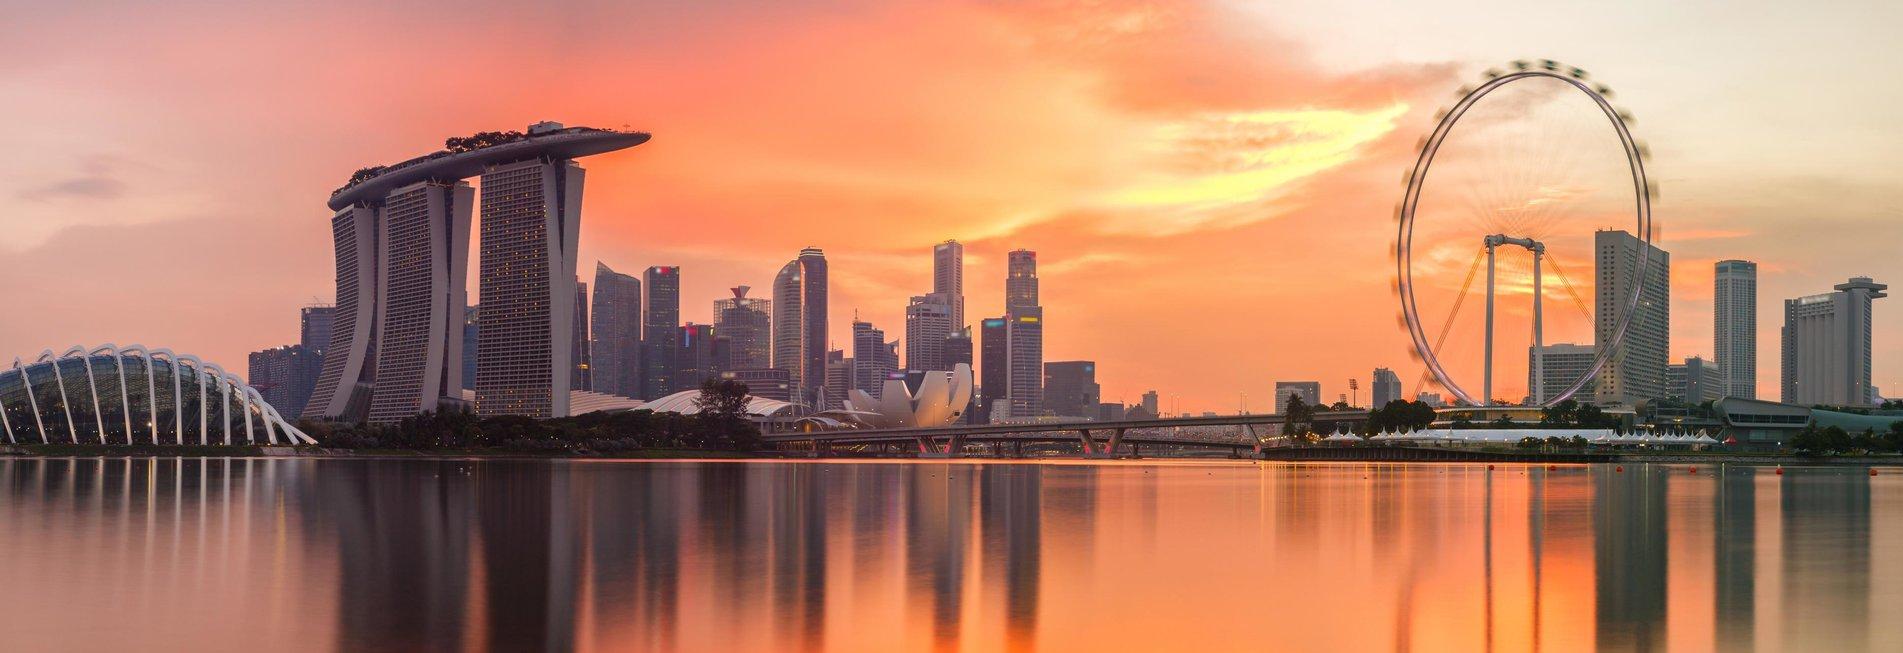 Kreuzfahrt - Norwegian Jade: Von Dubai nach Singapur